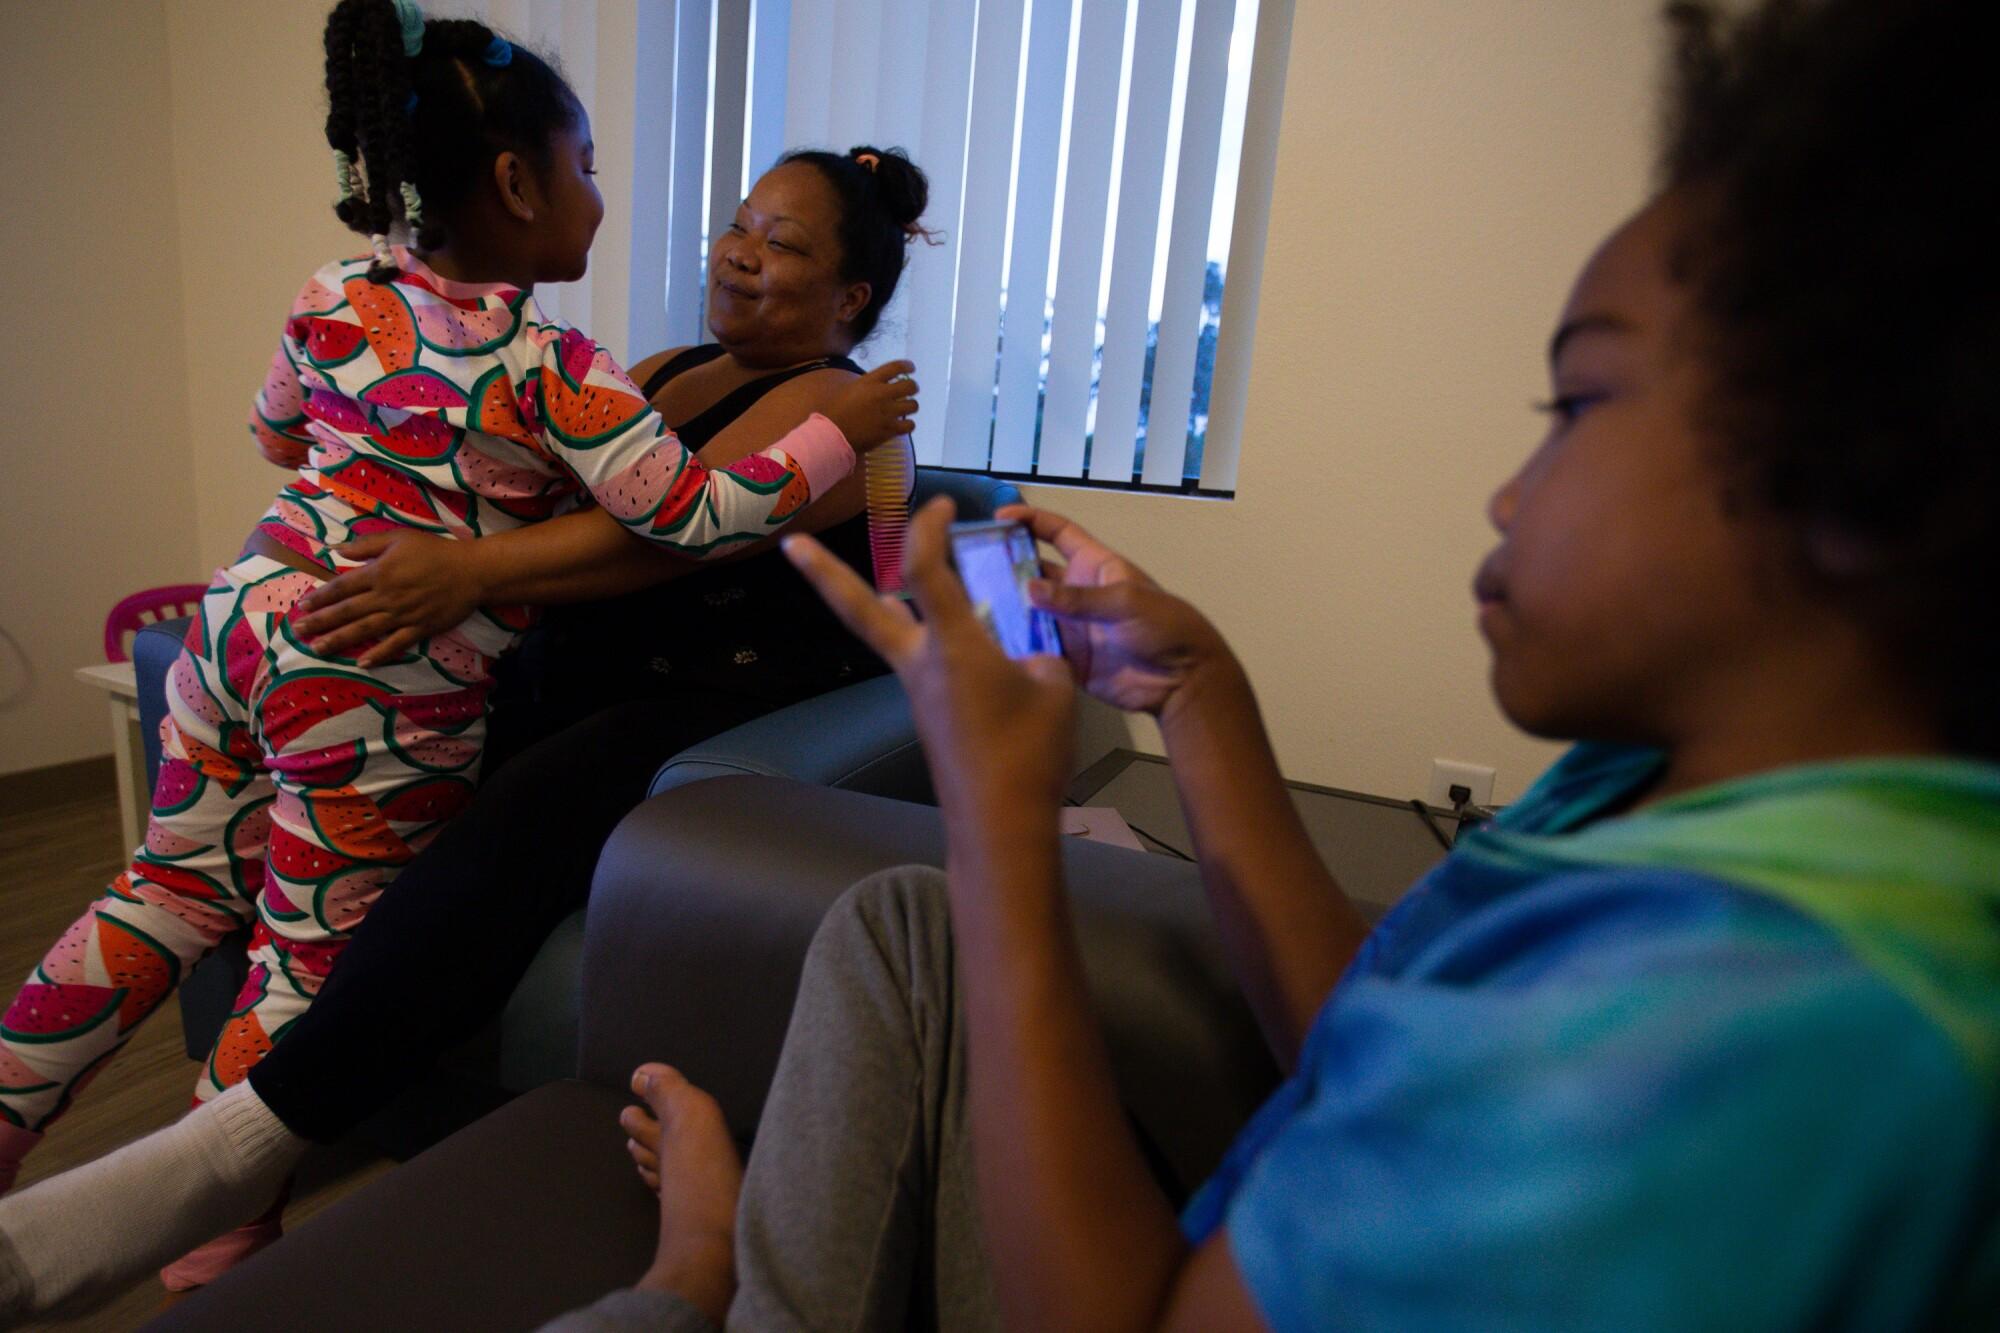 Janelle Miller embraces her daughter Anastazia alongside her son at the Salvation Army's Door of Hope transitional program